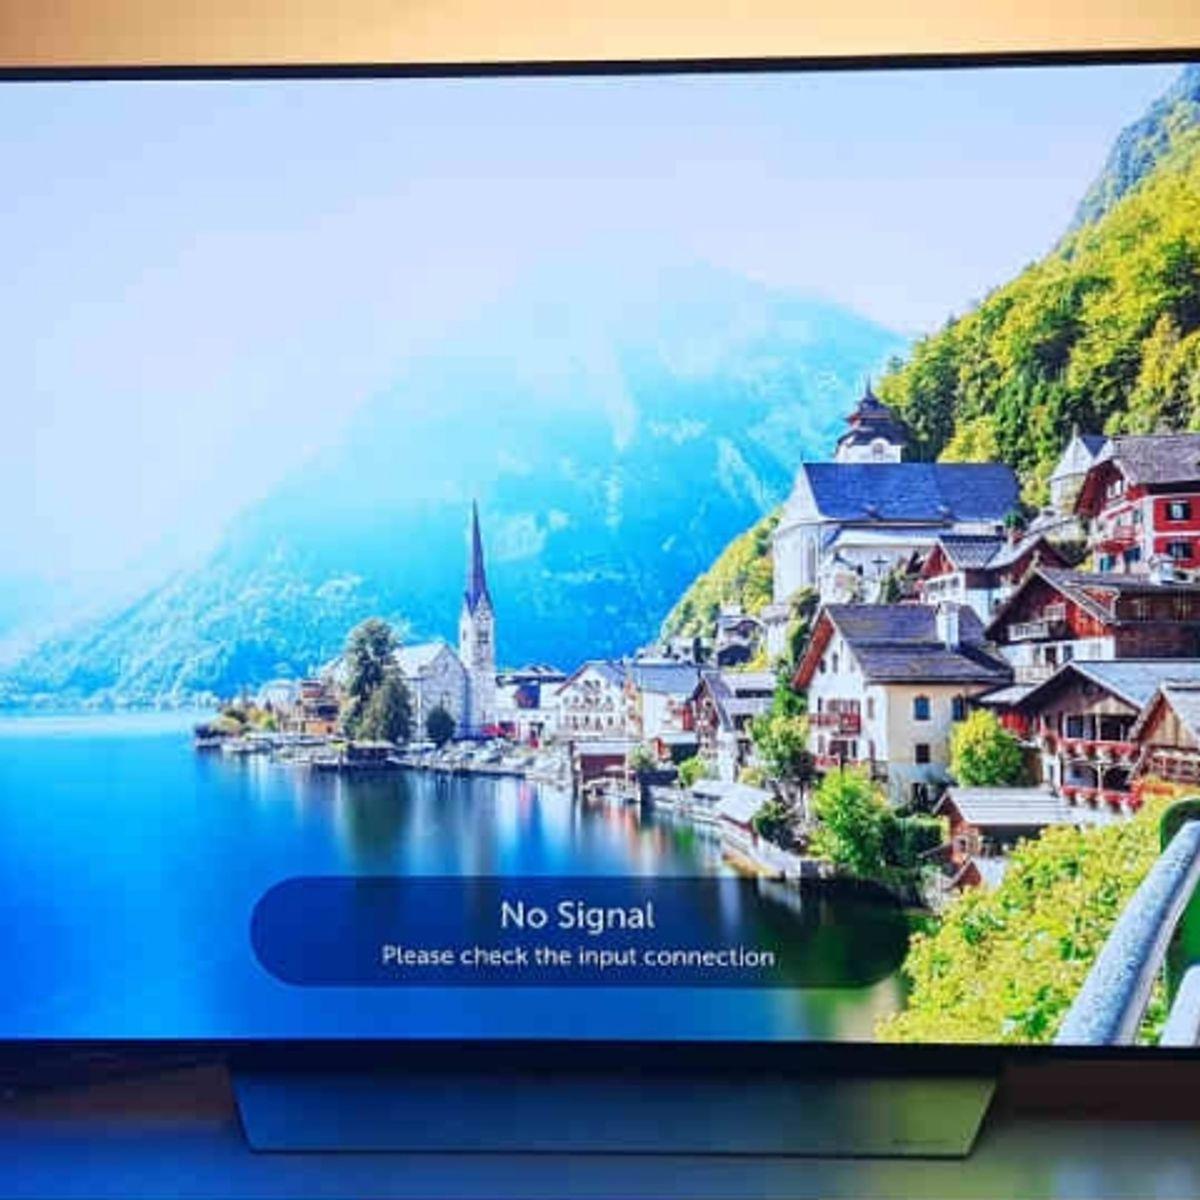 LG OLED65C7T Review